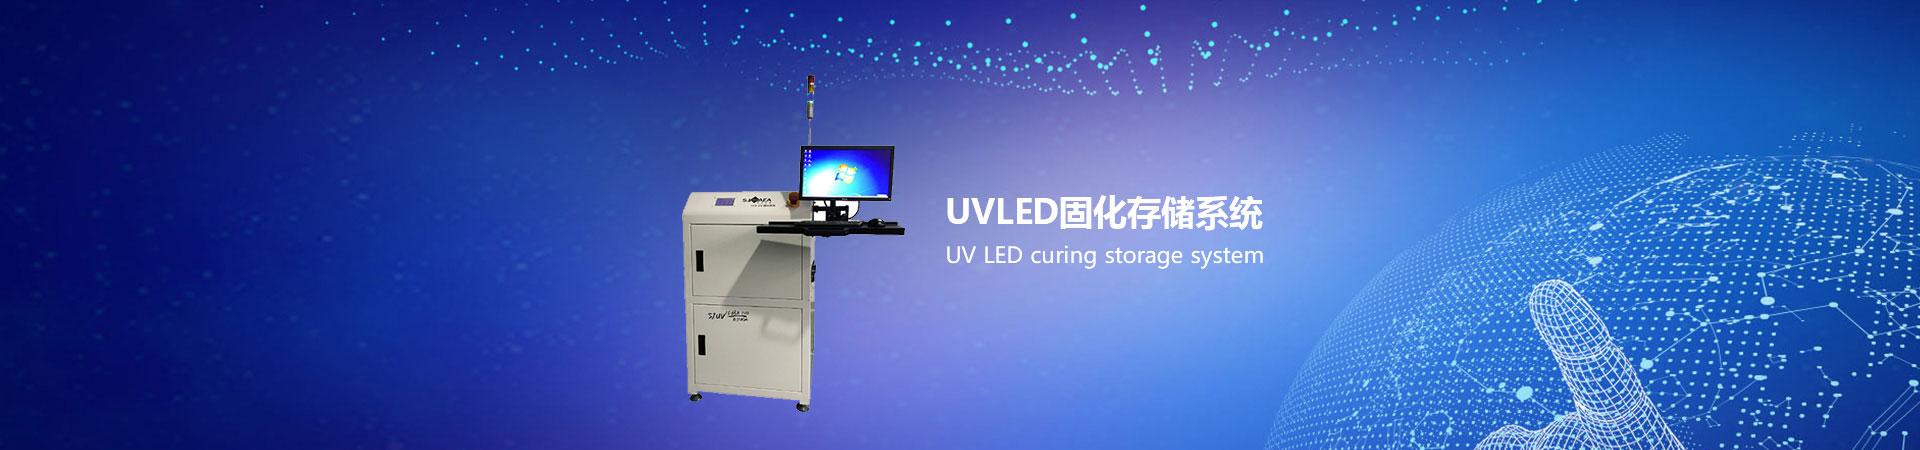 UVled固化